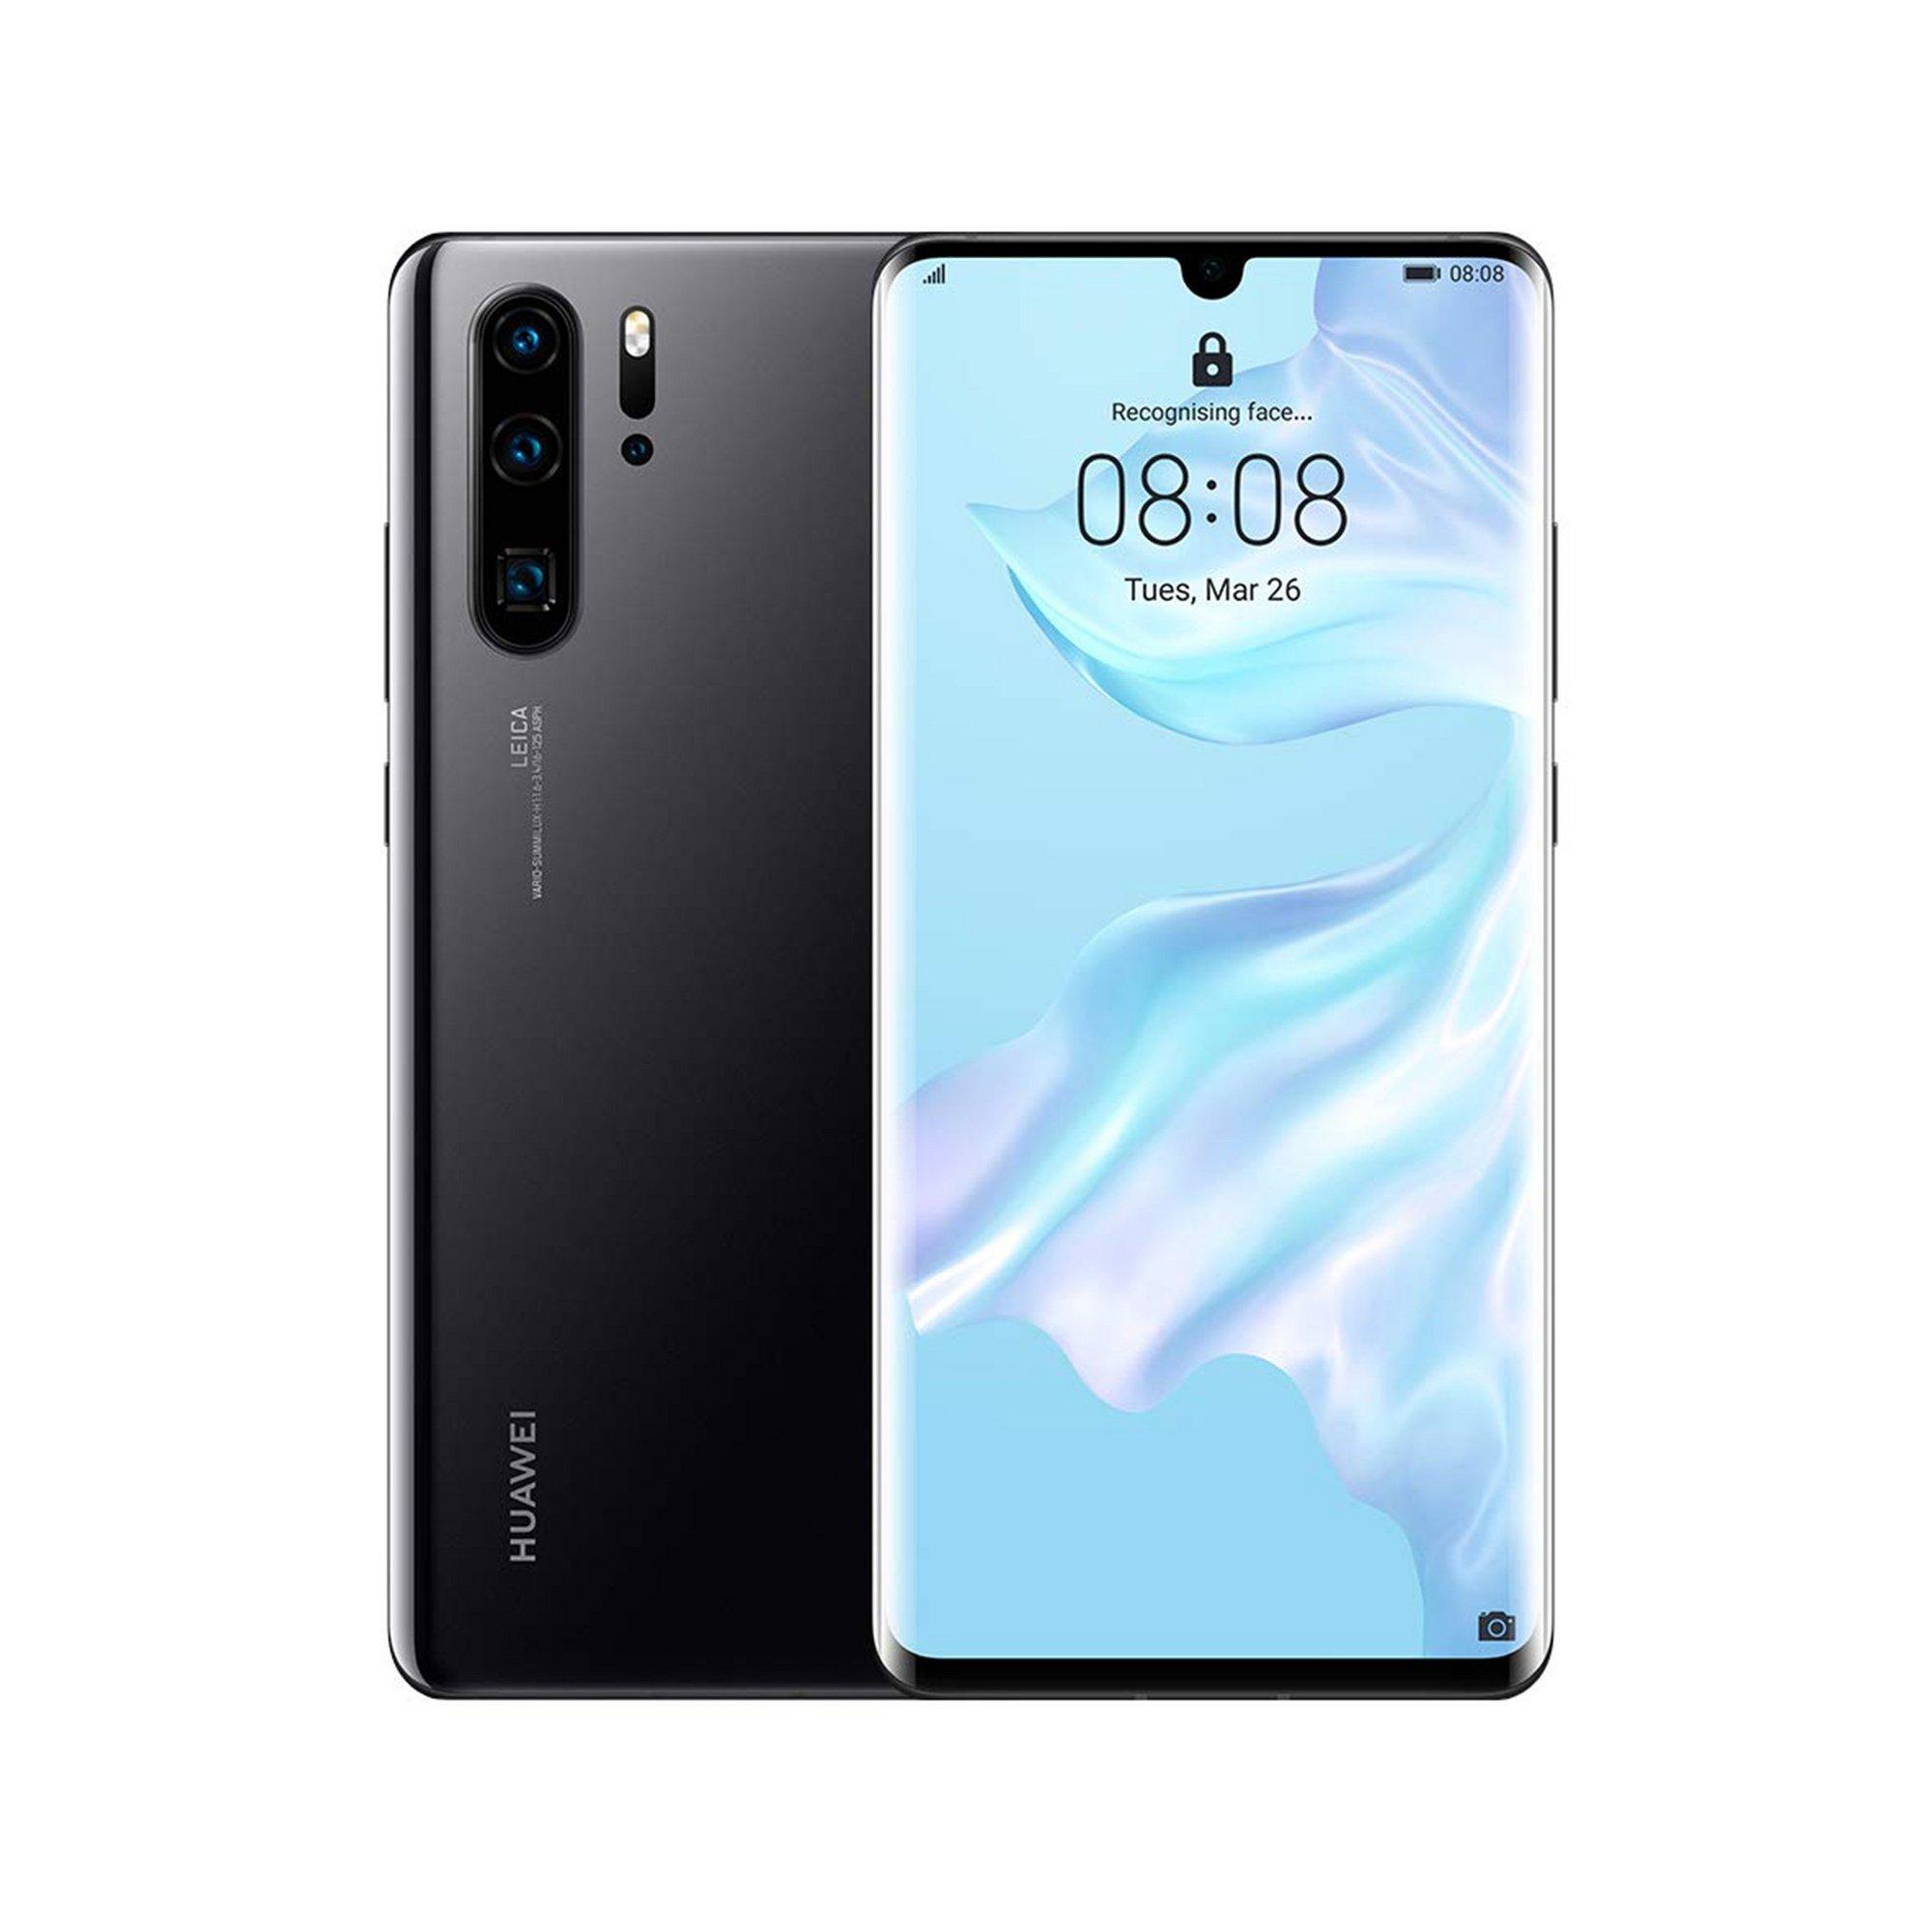 Image of Huawei P30 Pro 128GB Smartphone